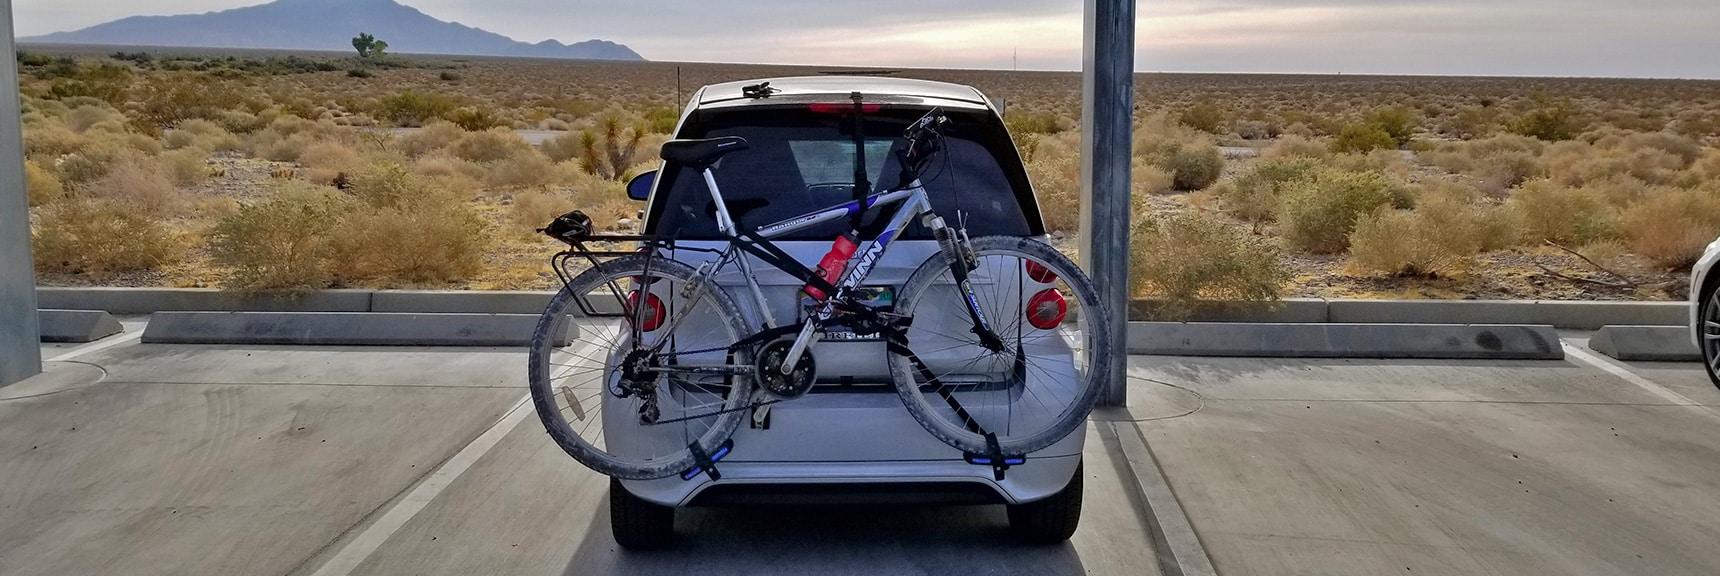 Rear View of Mounted Bike | Smart Car Bike Rack and Mountain Bike Test, Sheep Range, Nevada